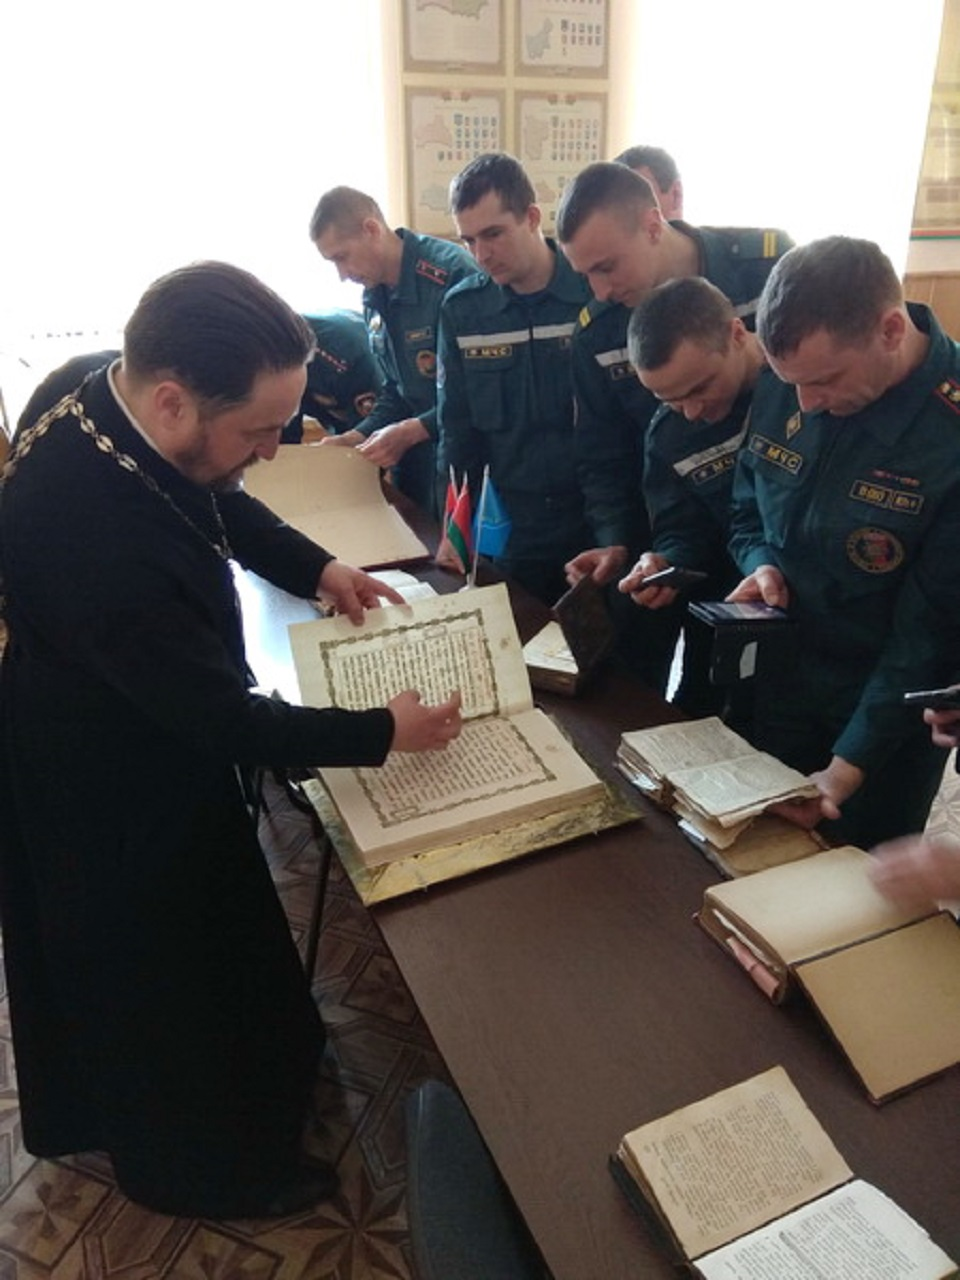 Спасатели смотрят книги